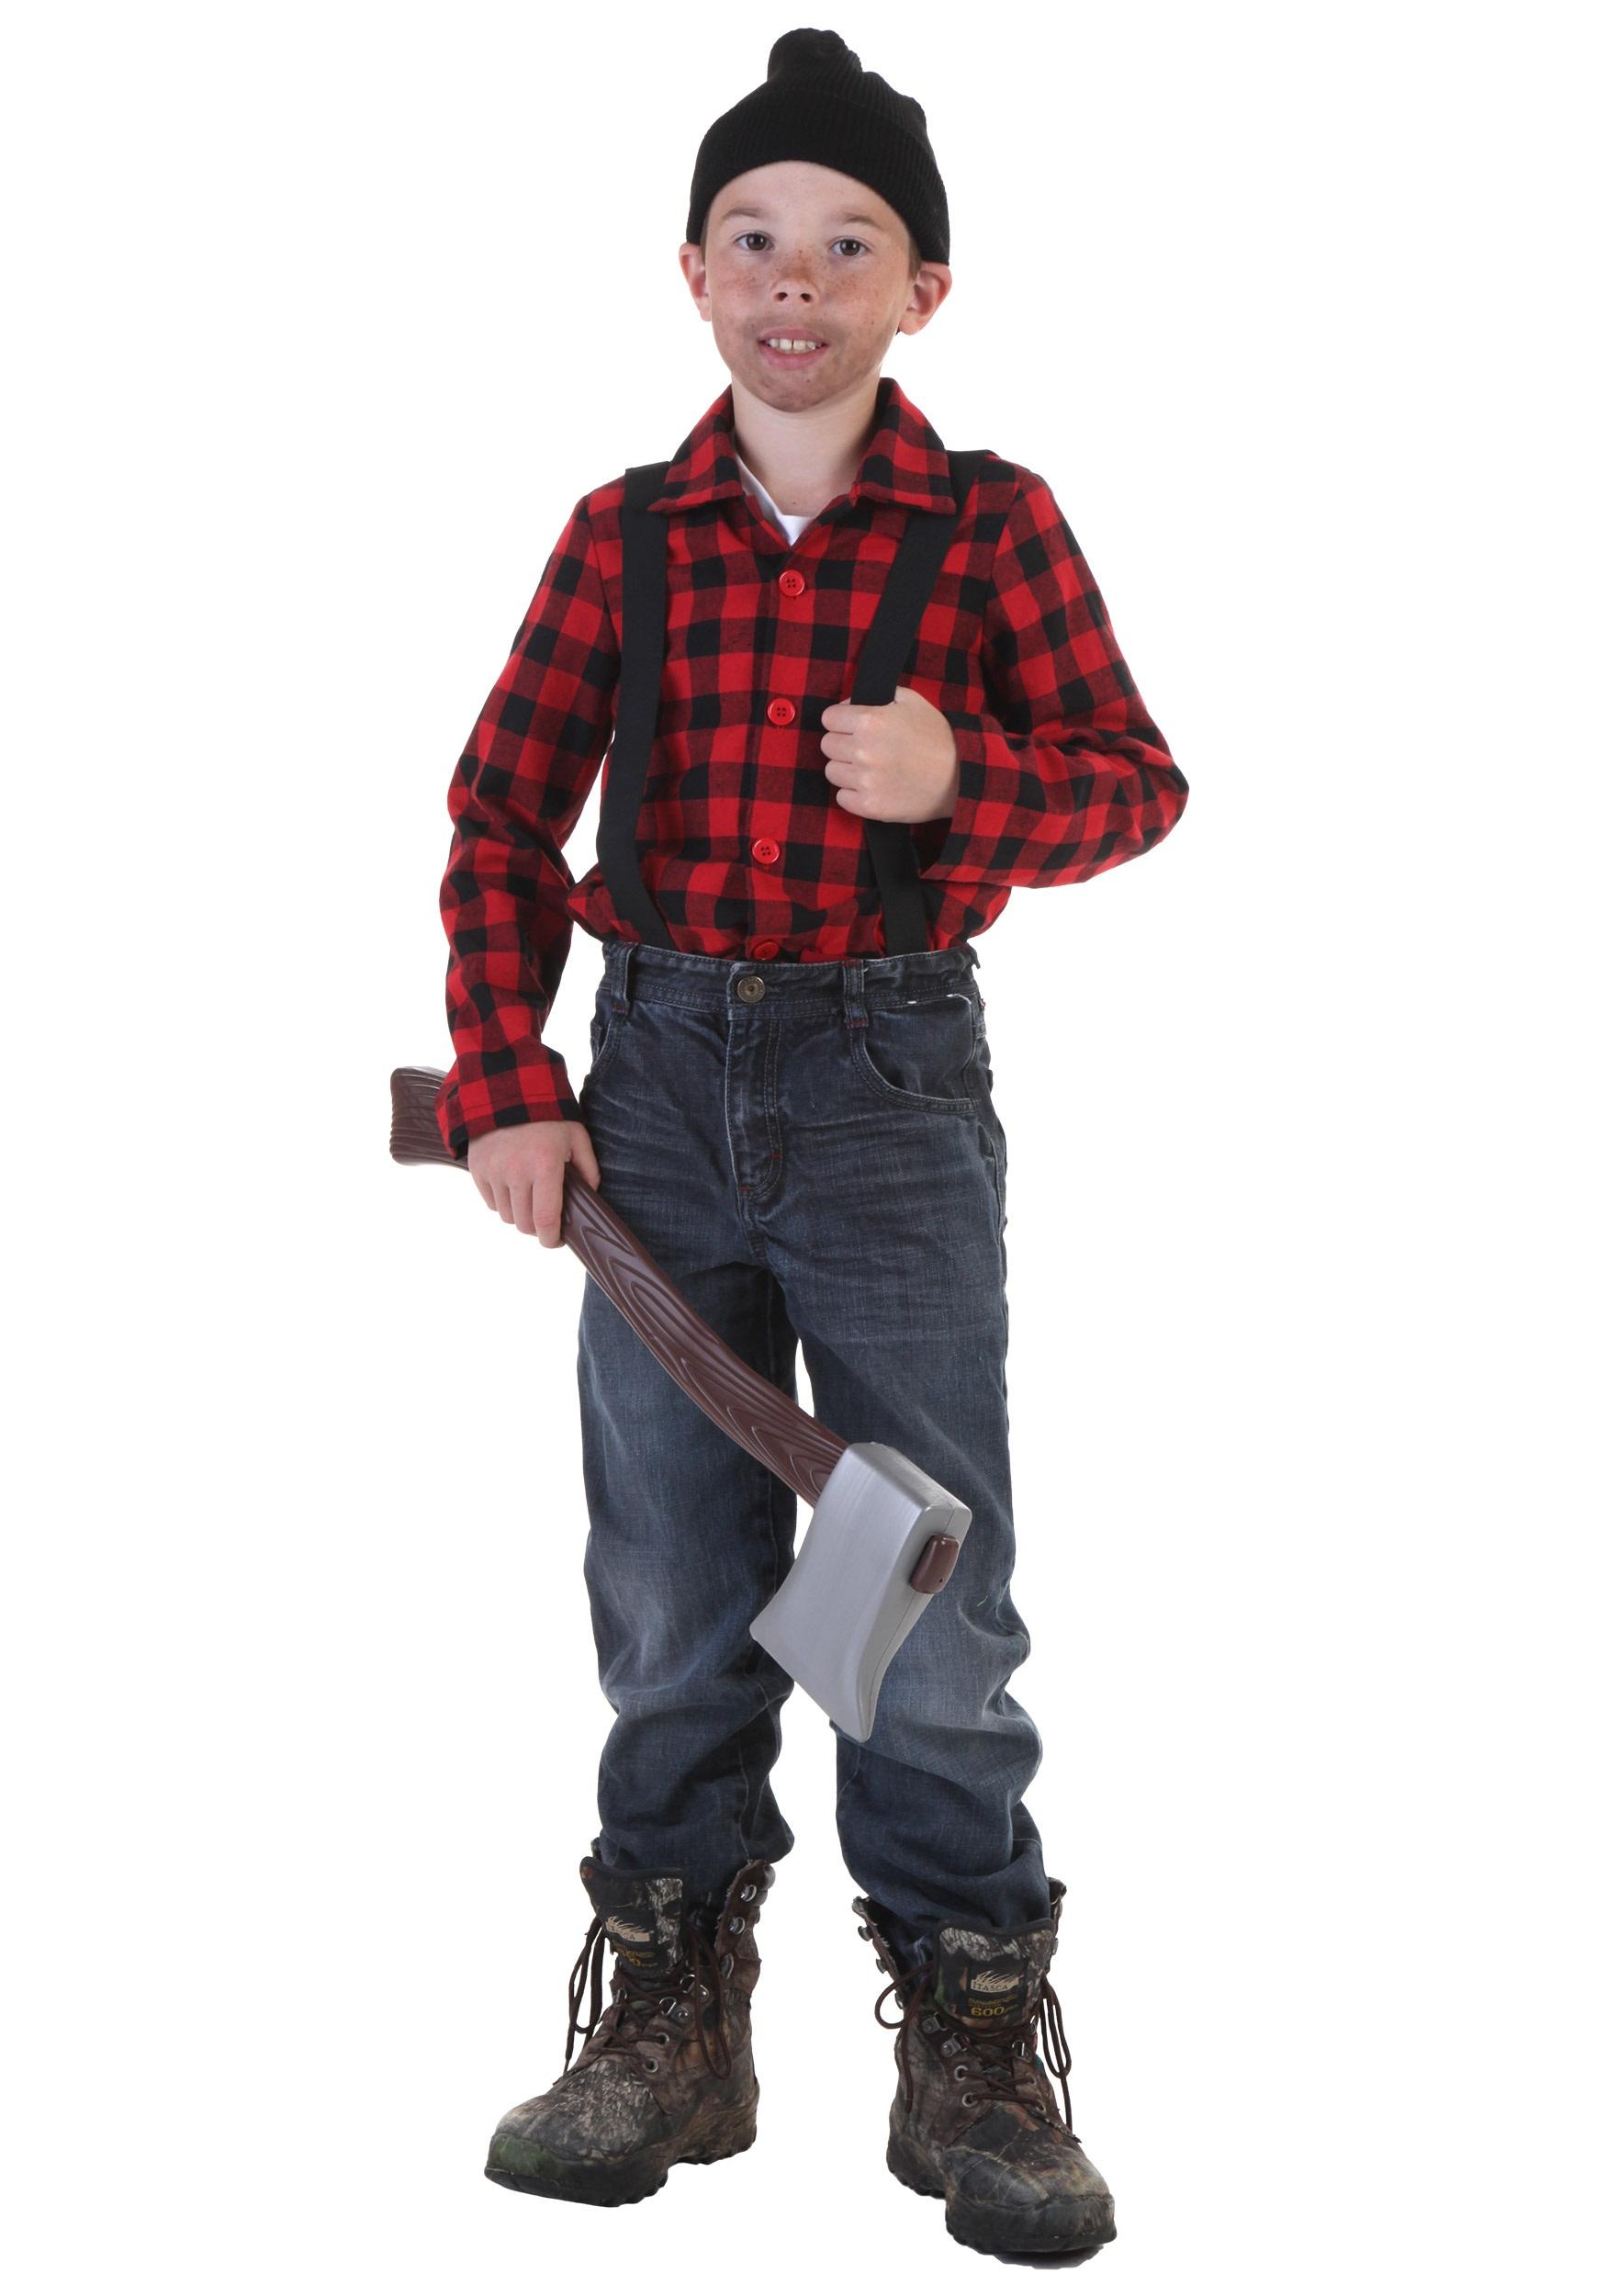 Костюм железного дровосека для ребенка